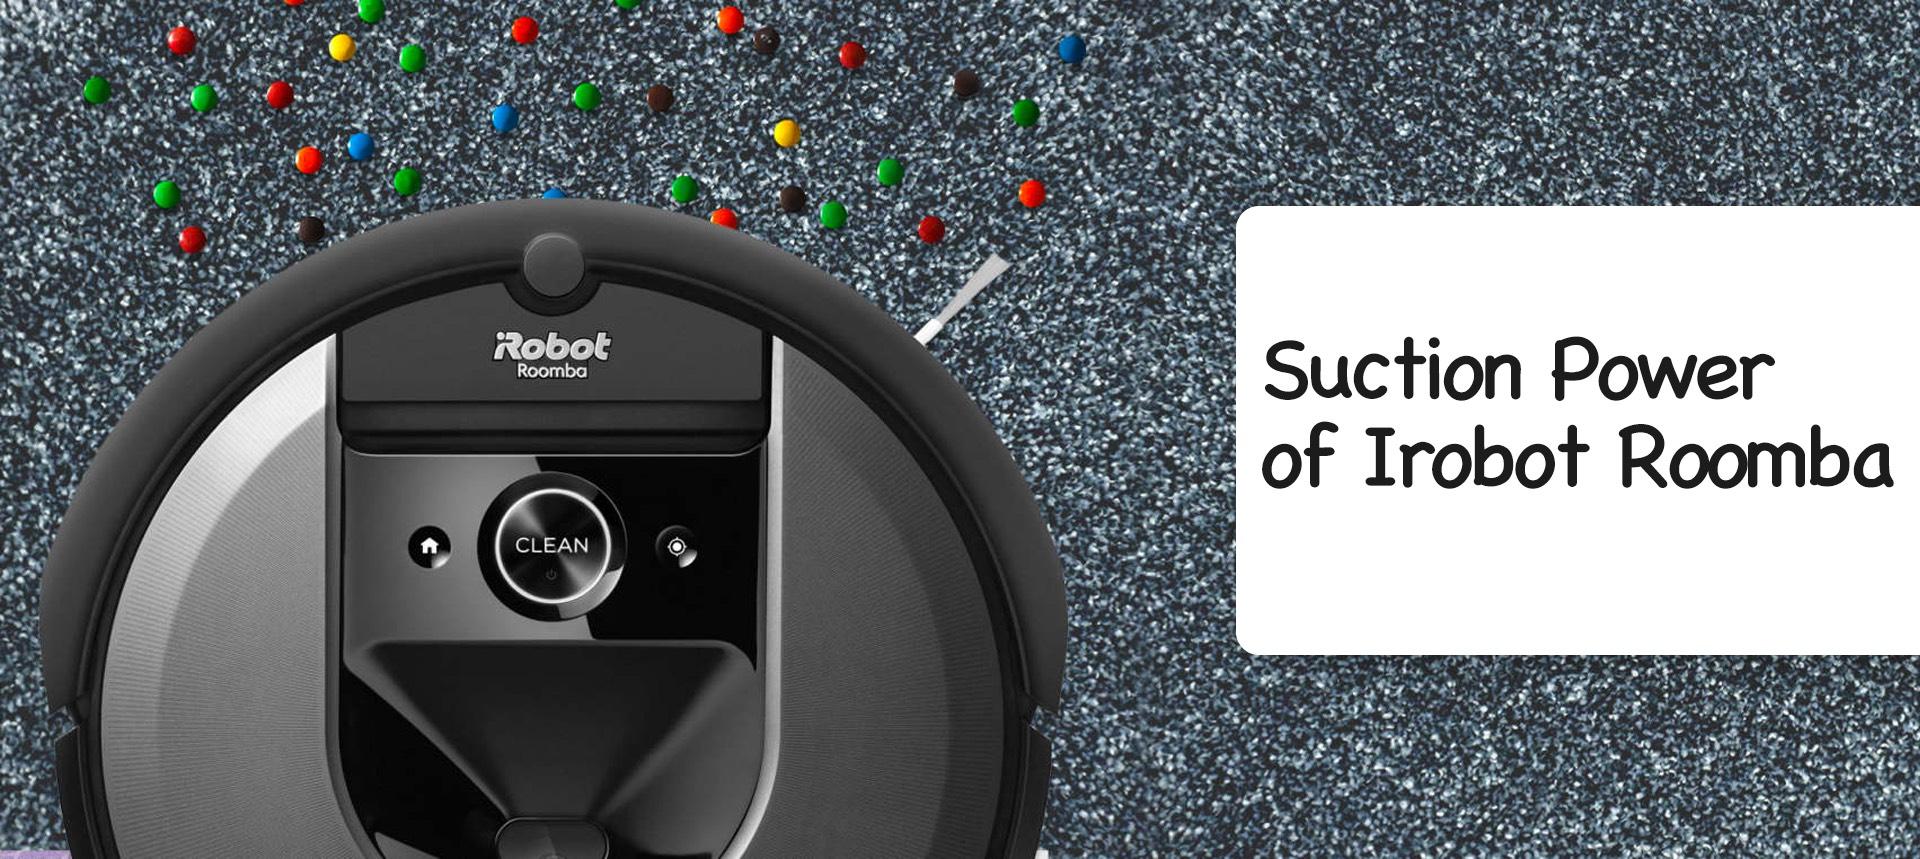 Suction Power of Irobot Roomba